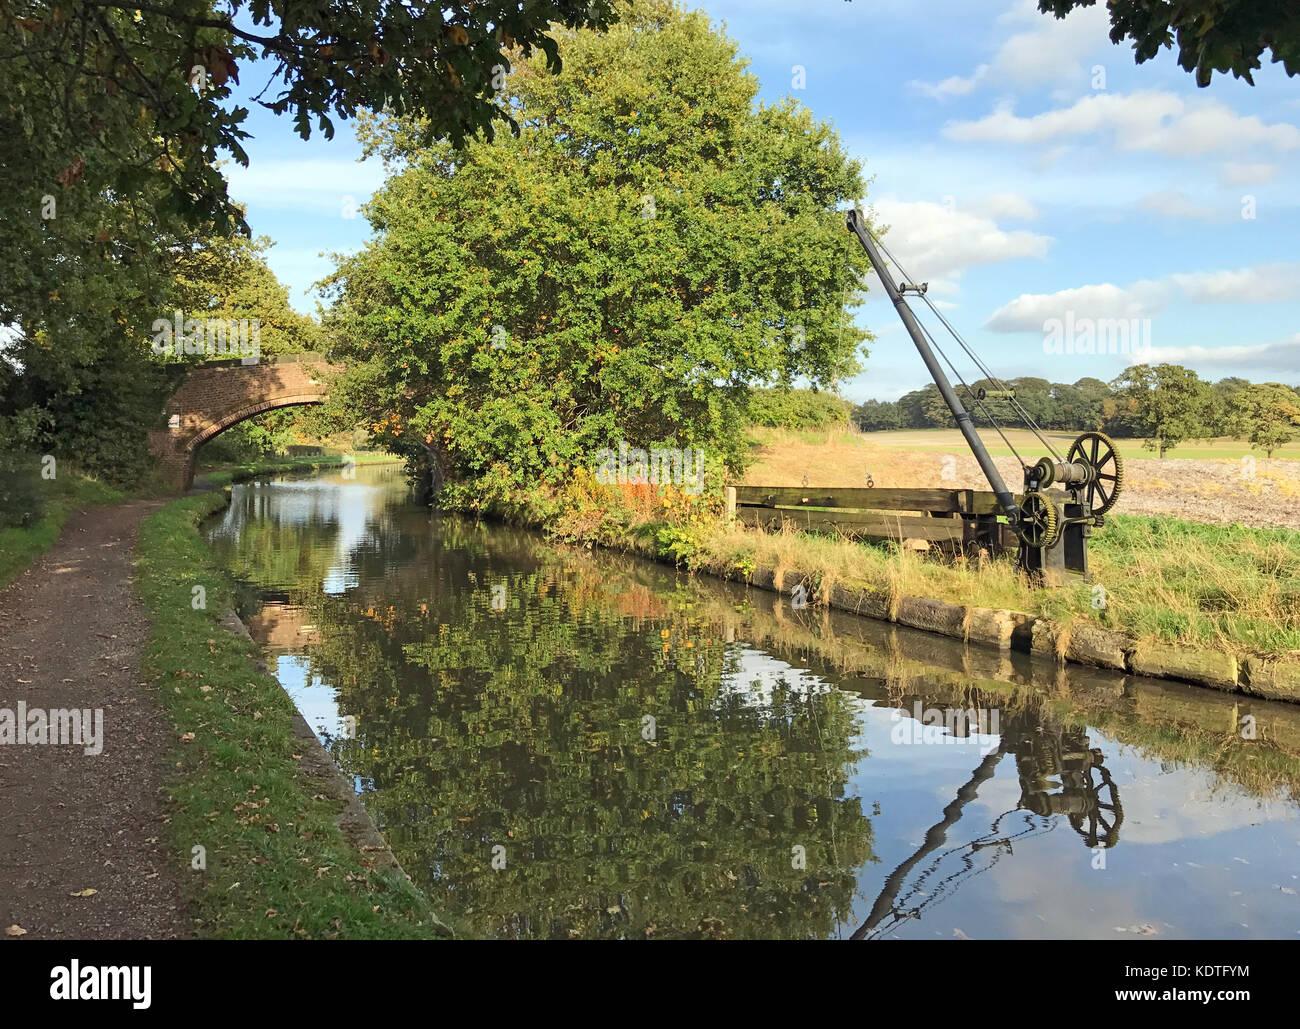 Lifting gear, Bridgewater Canal, Moore, Cheshire, England, UK - Stock Image